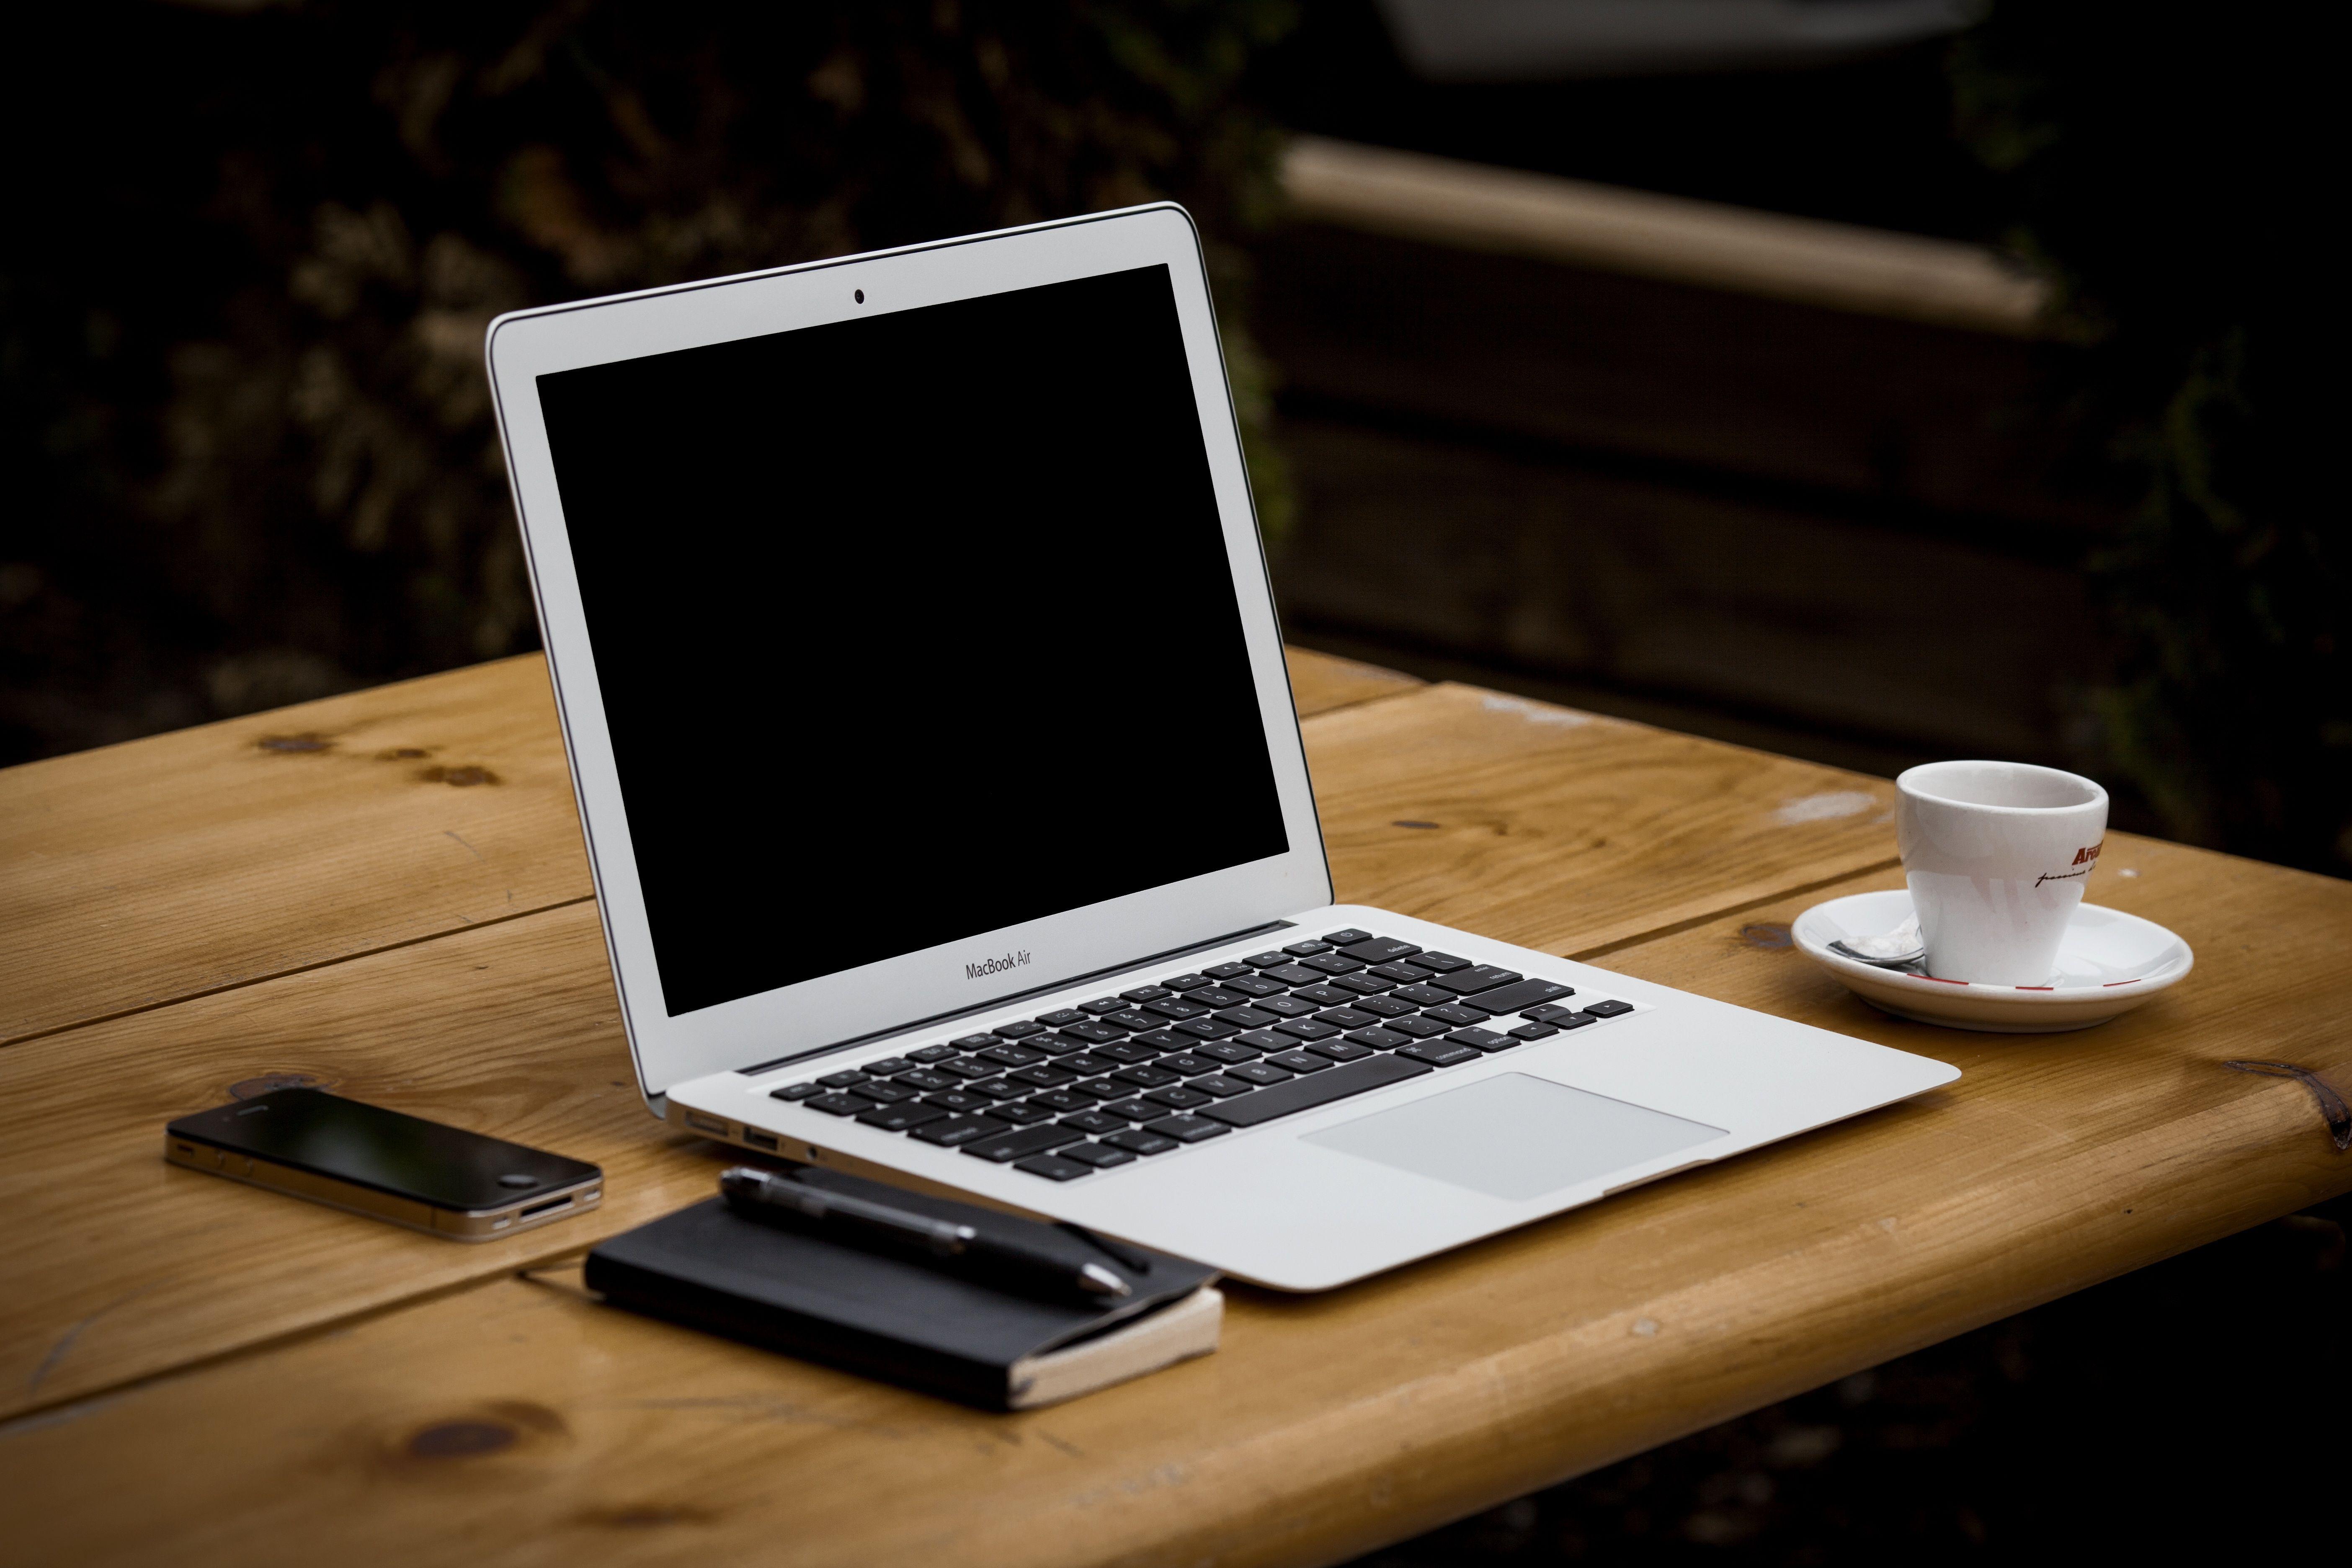 SAP Business One run on computer